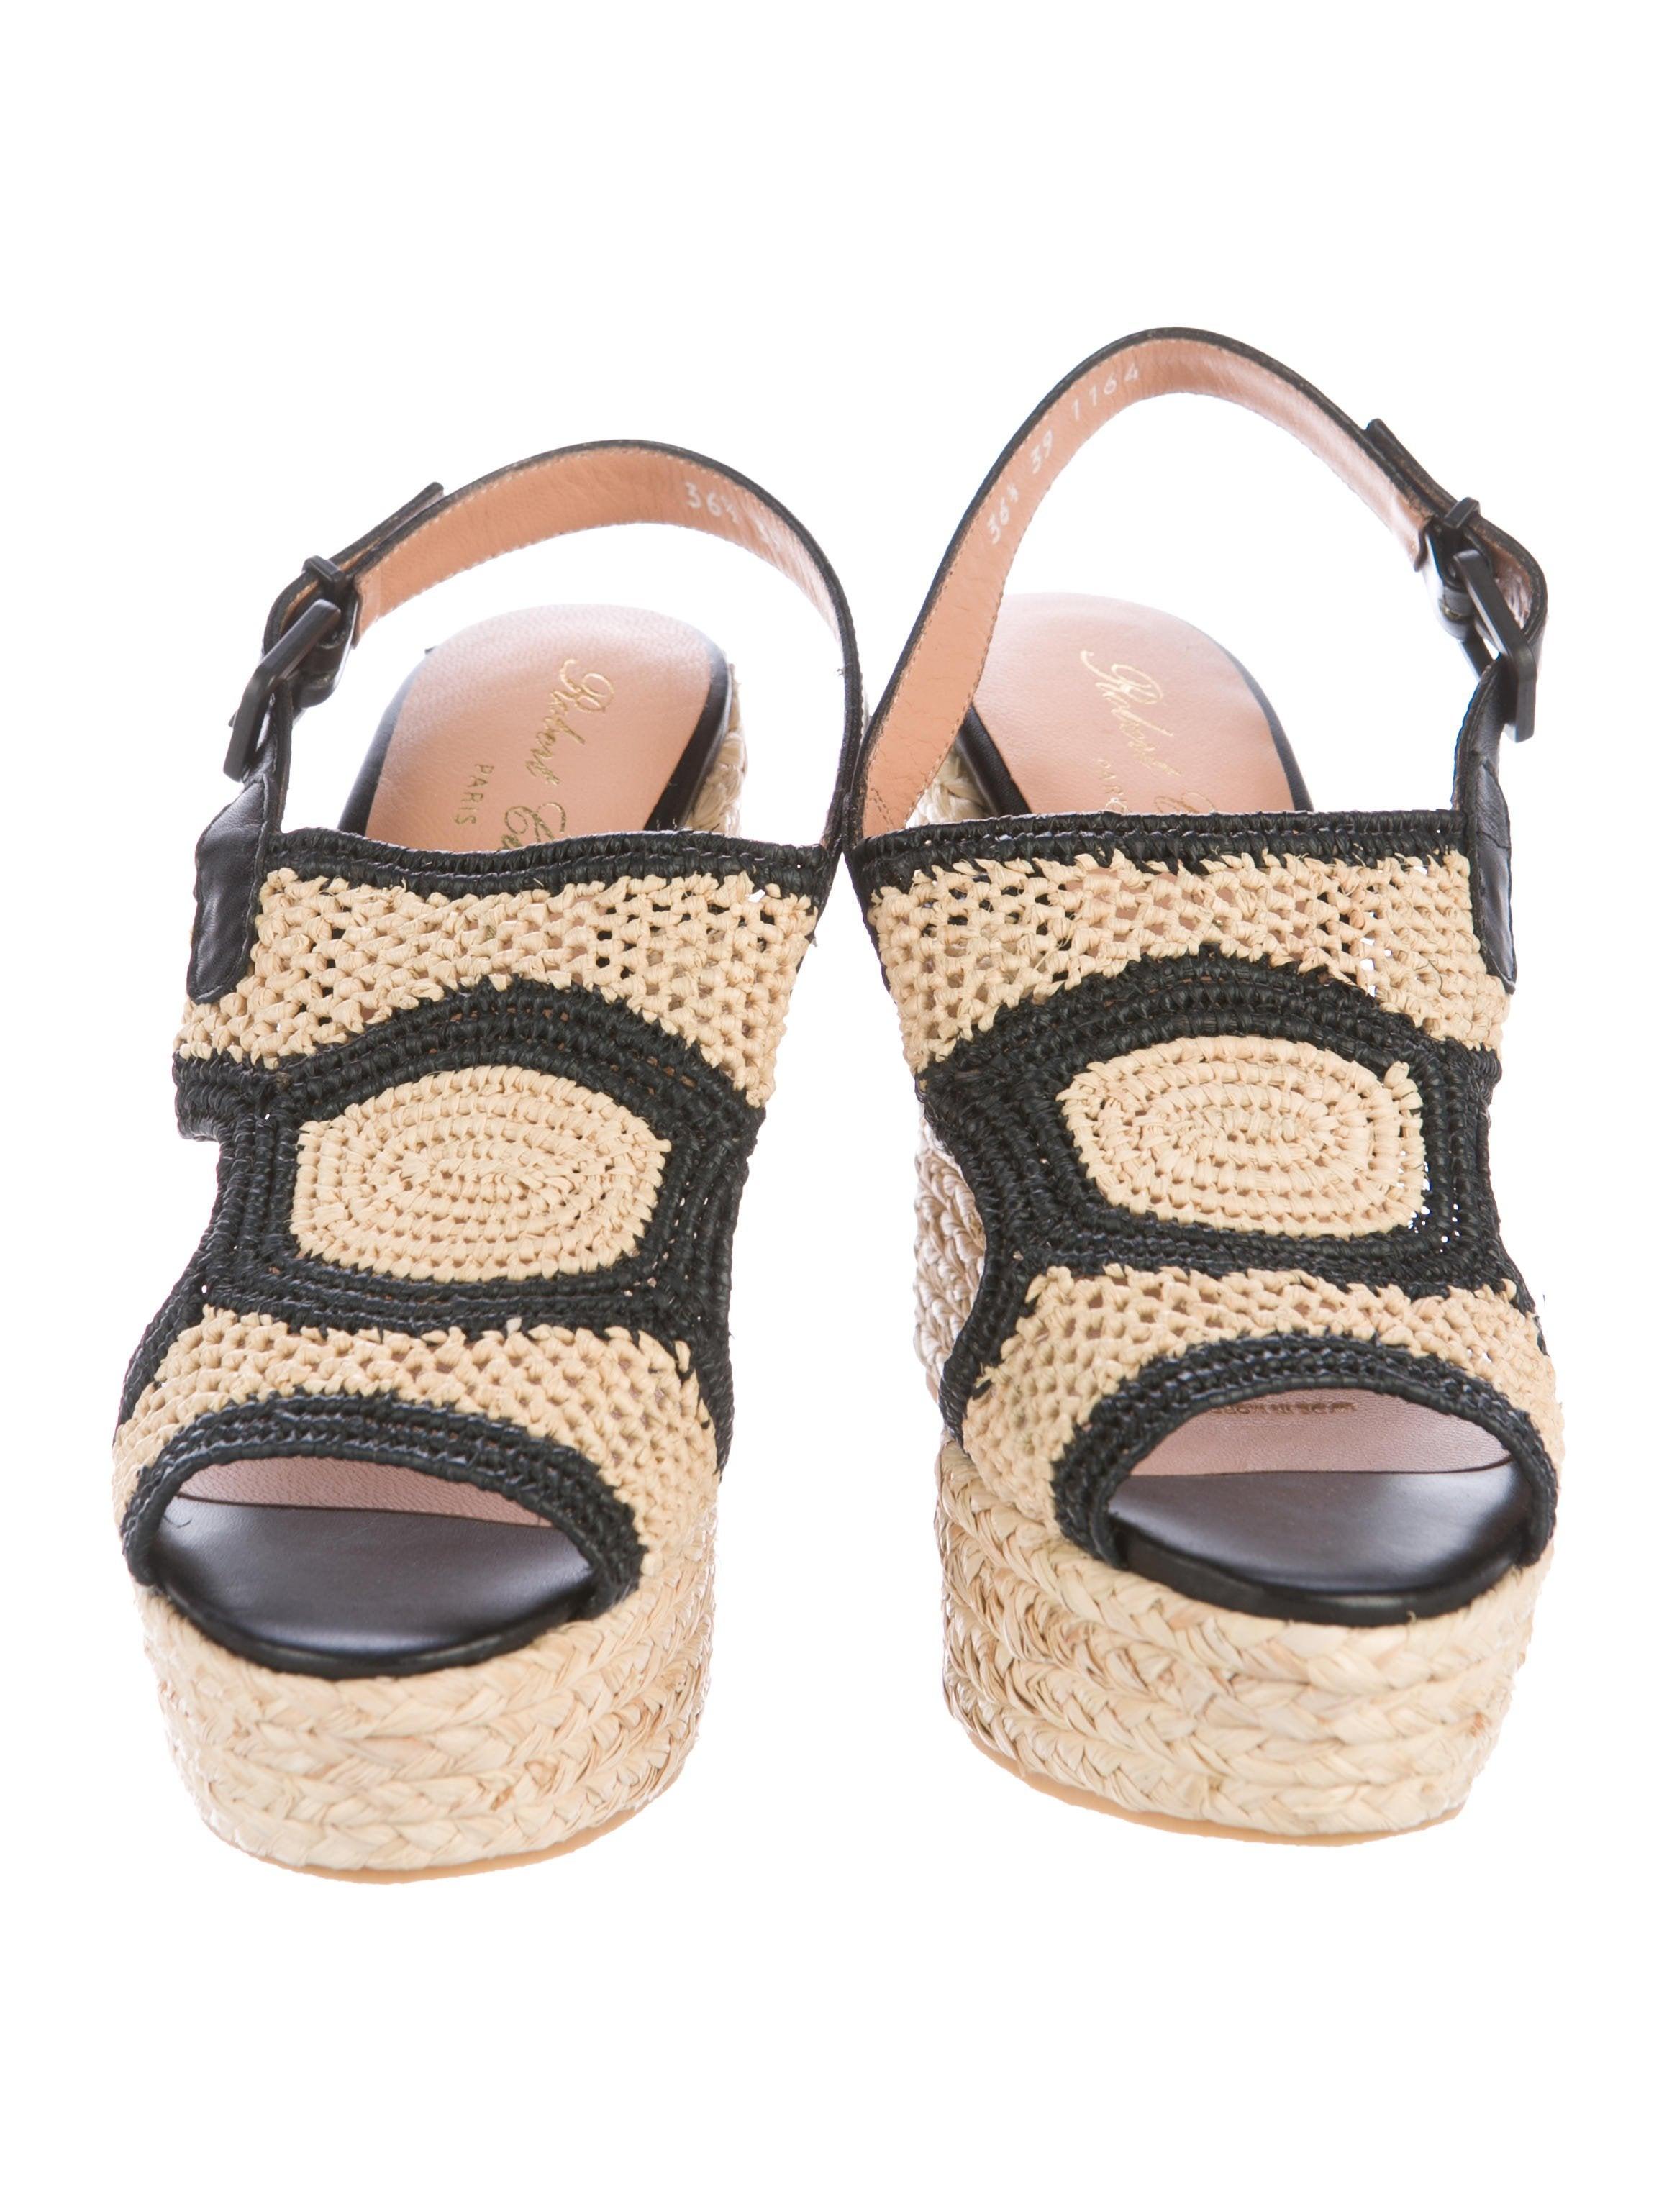 Robert Clergerie Drastic Raffia Sandals w/ Tags cheap sale big sale lxE140v